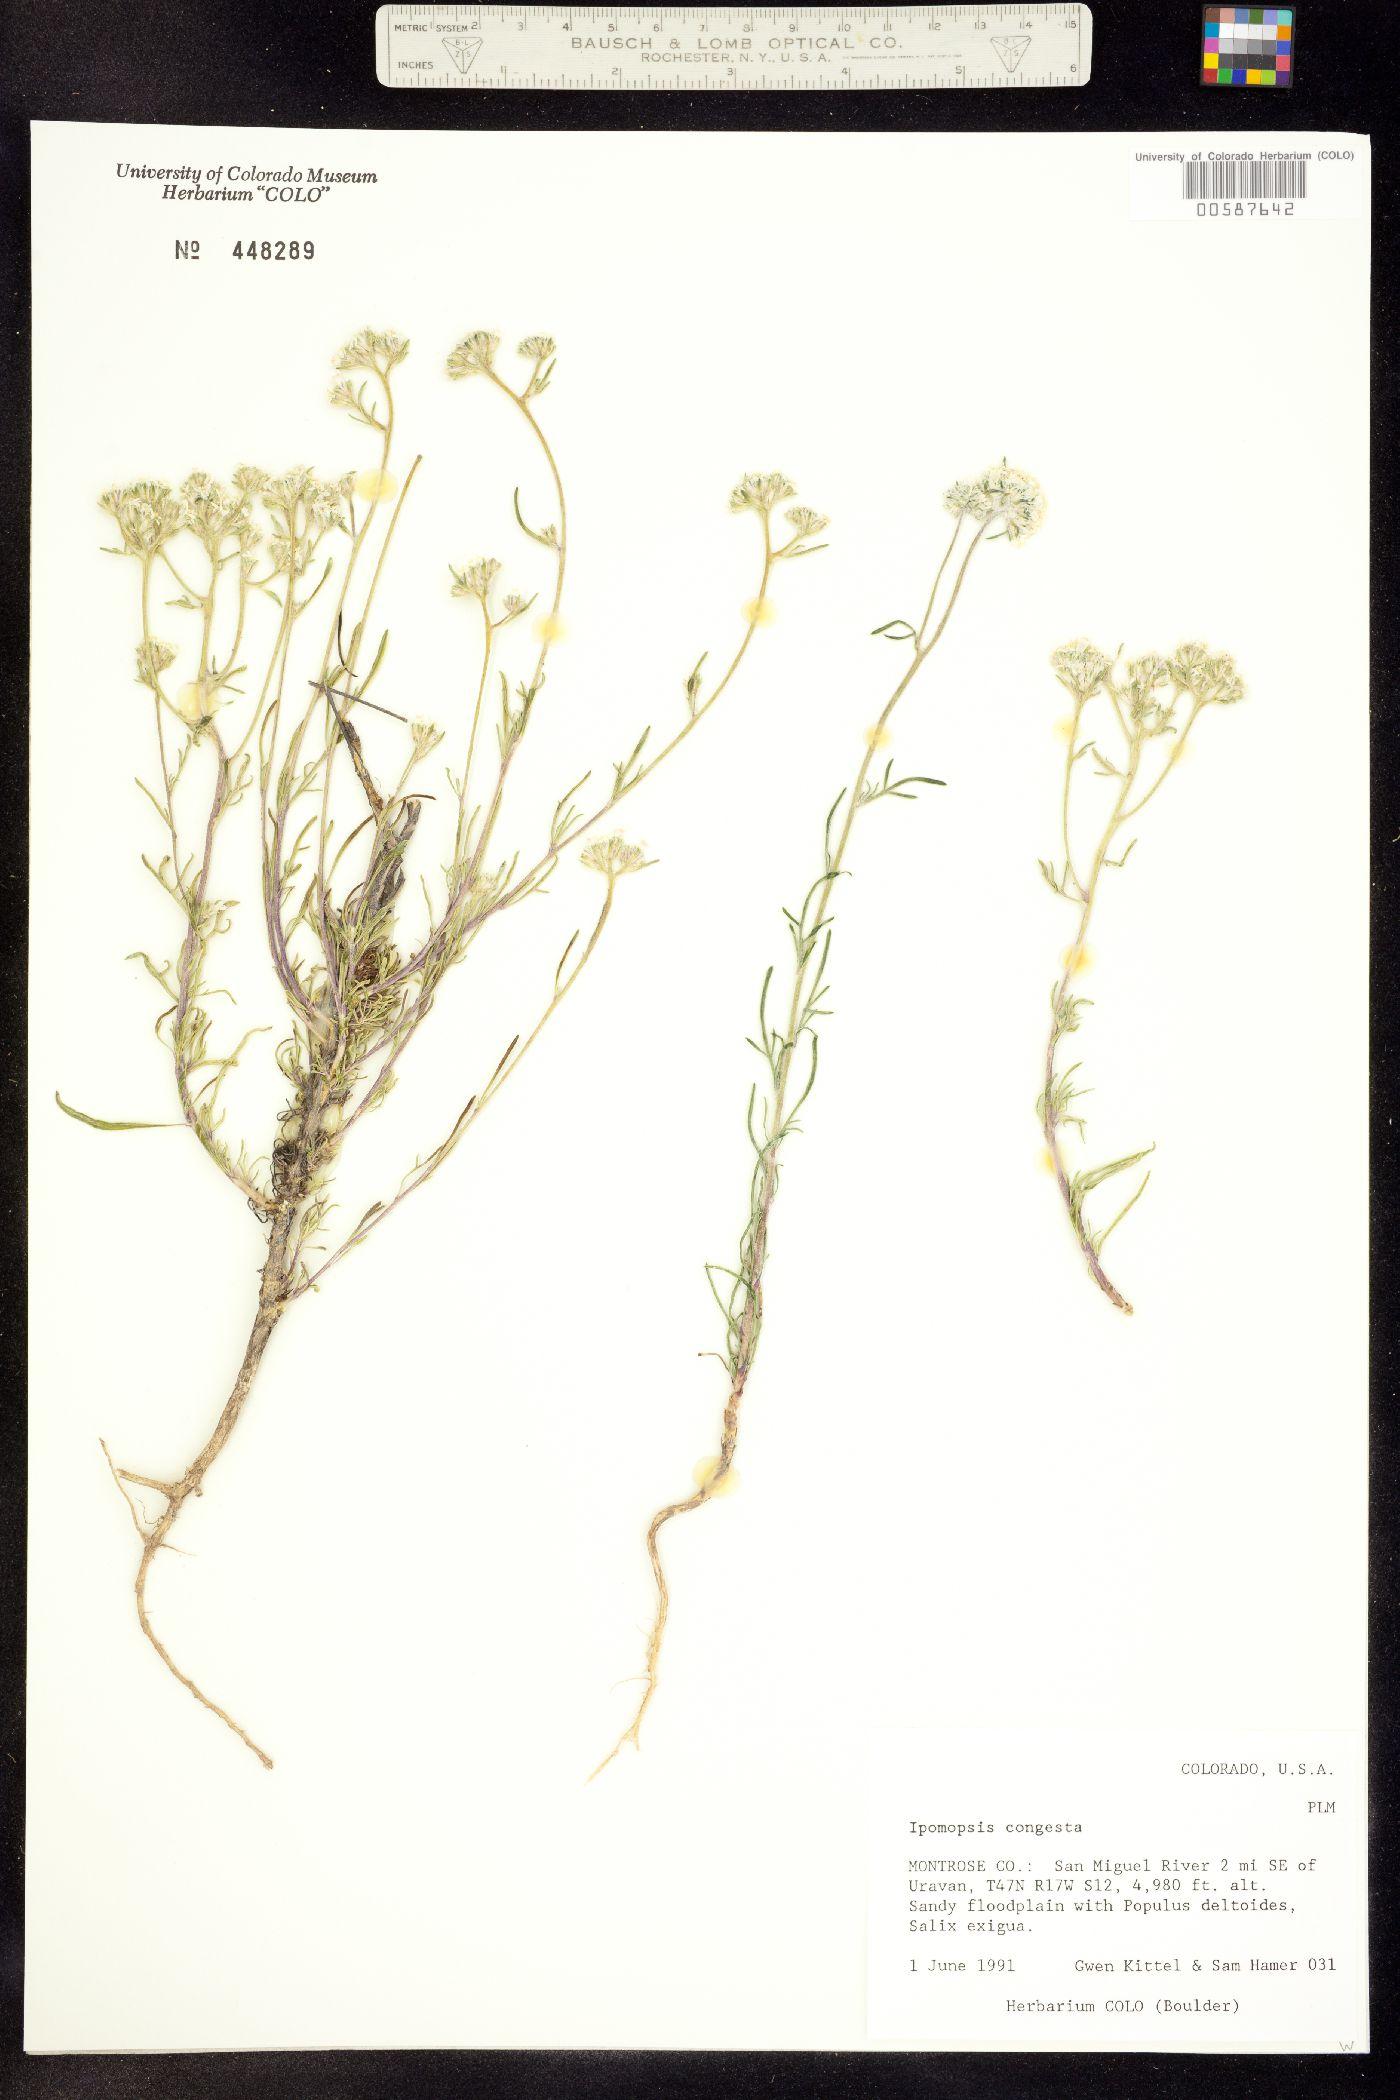 Ipomopsis congesta subsp. congesta image